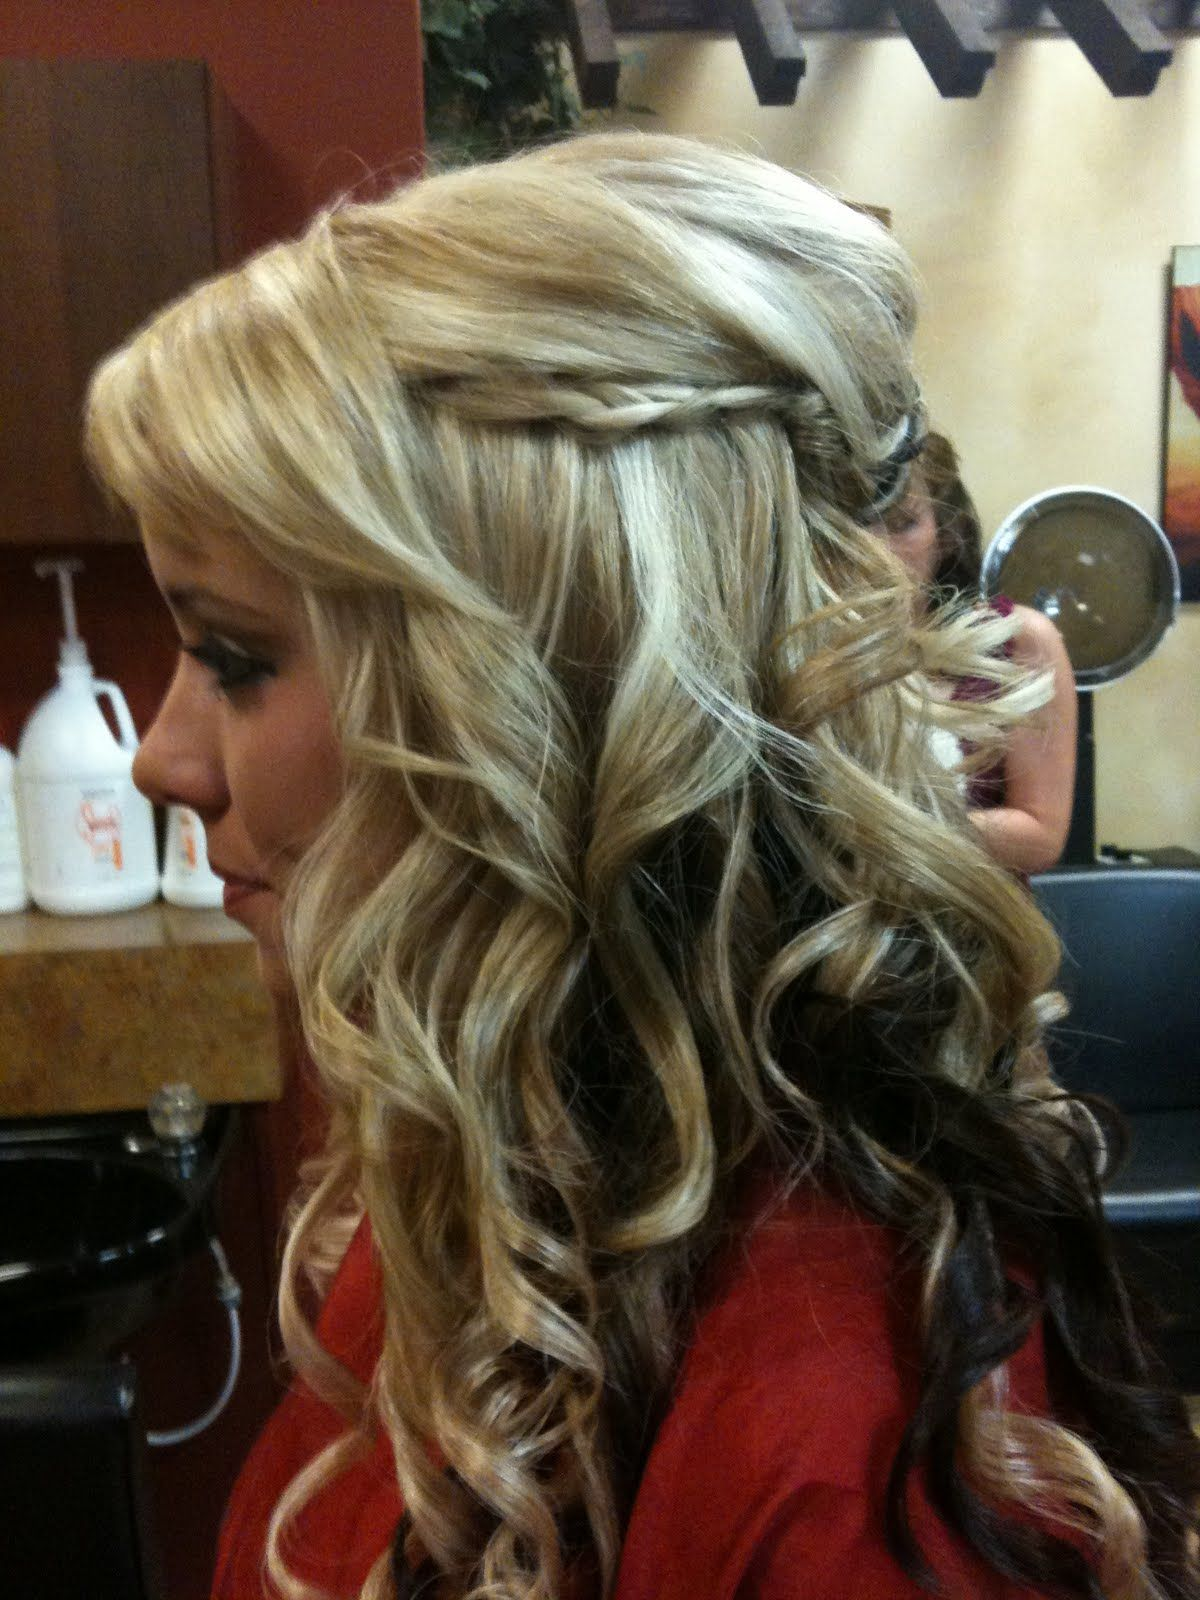 Hairbyadrianne updo prom homecoming formal cutehair blonde